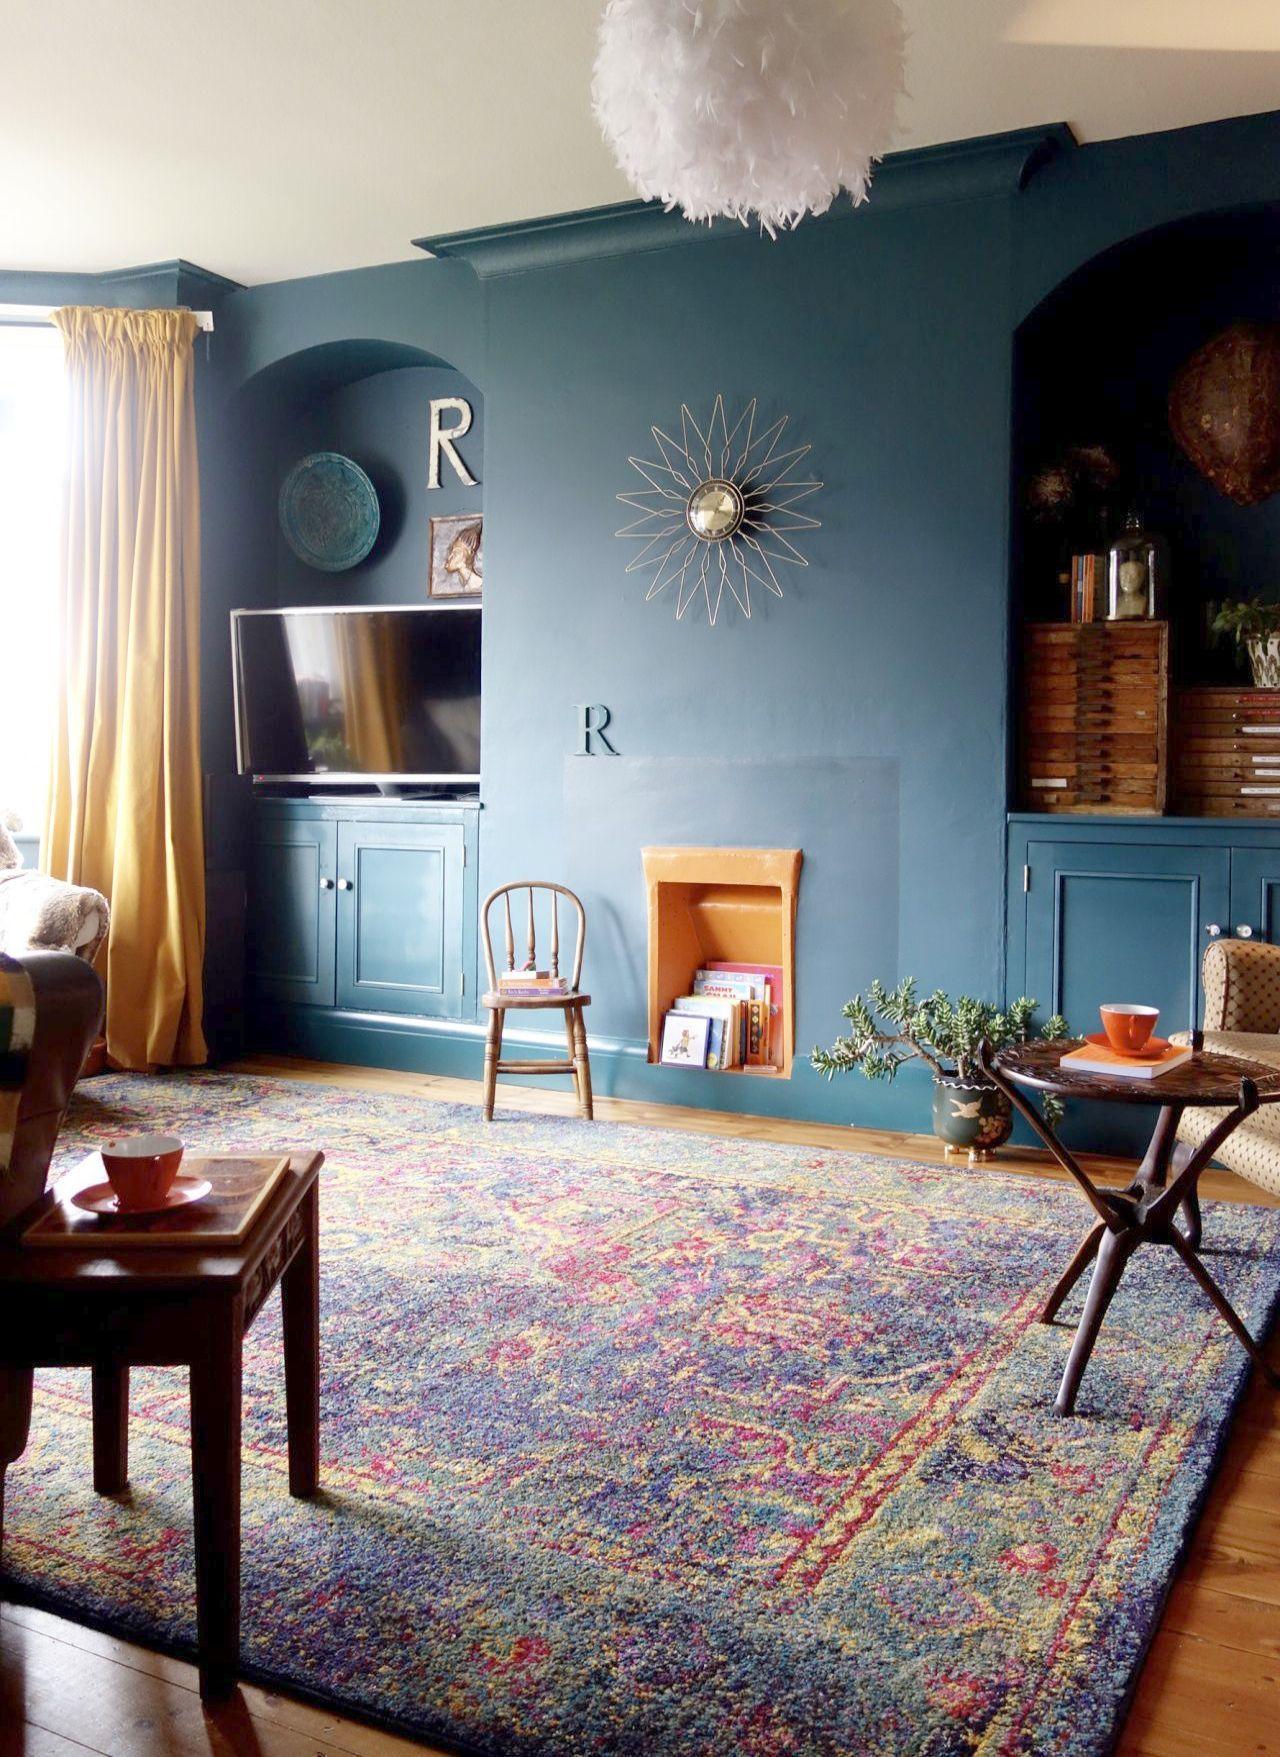 Home Decor Meaning Home Interior Design Software Free Home